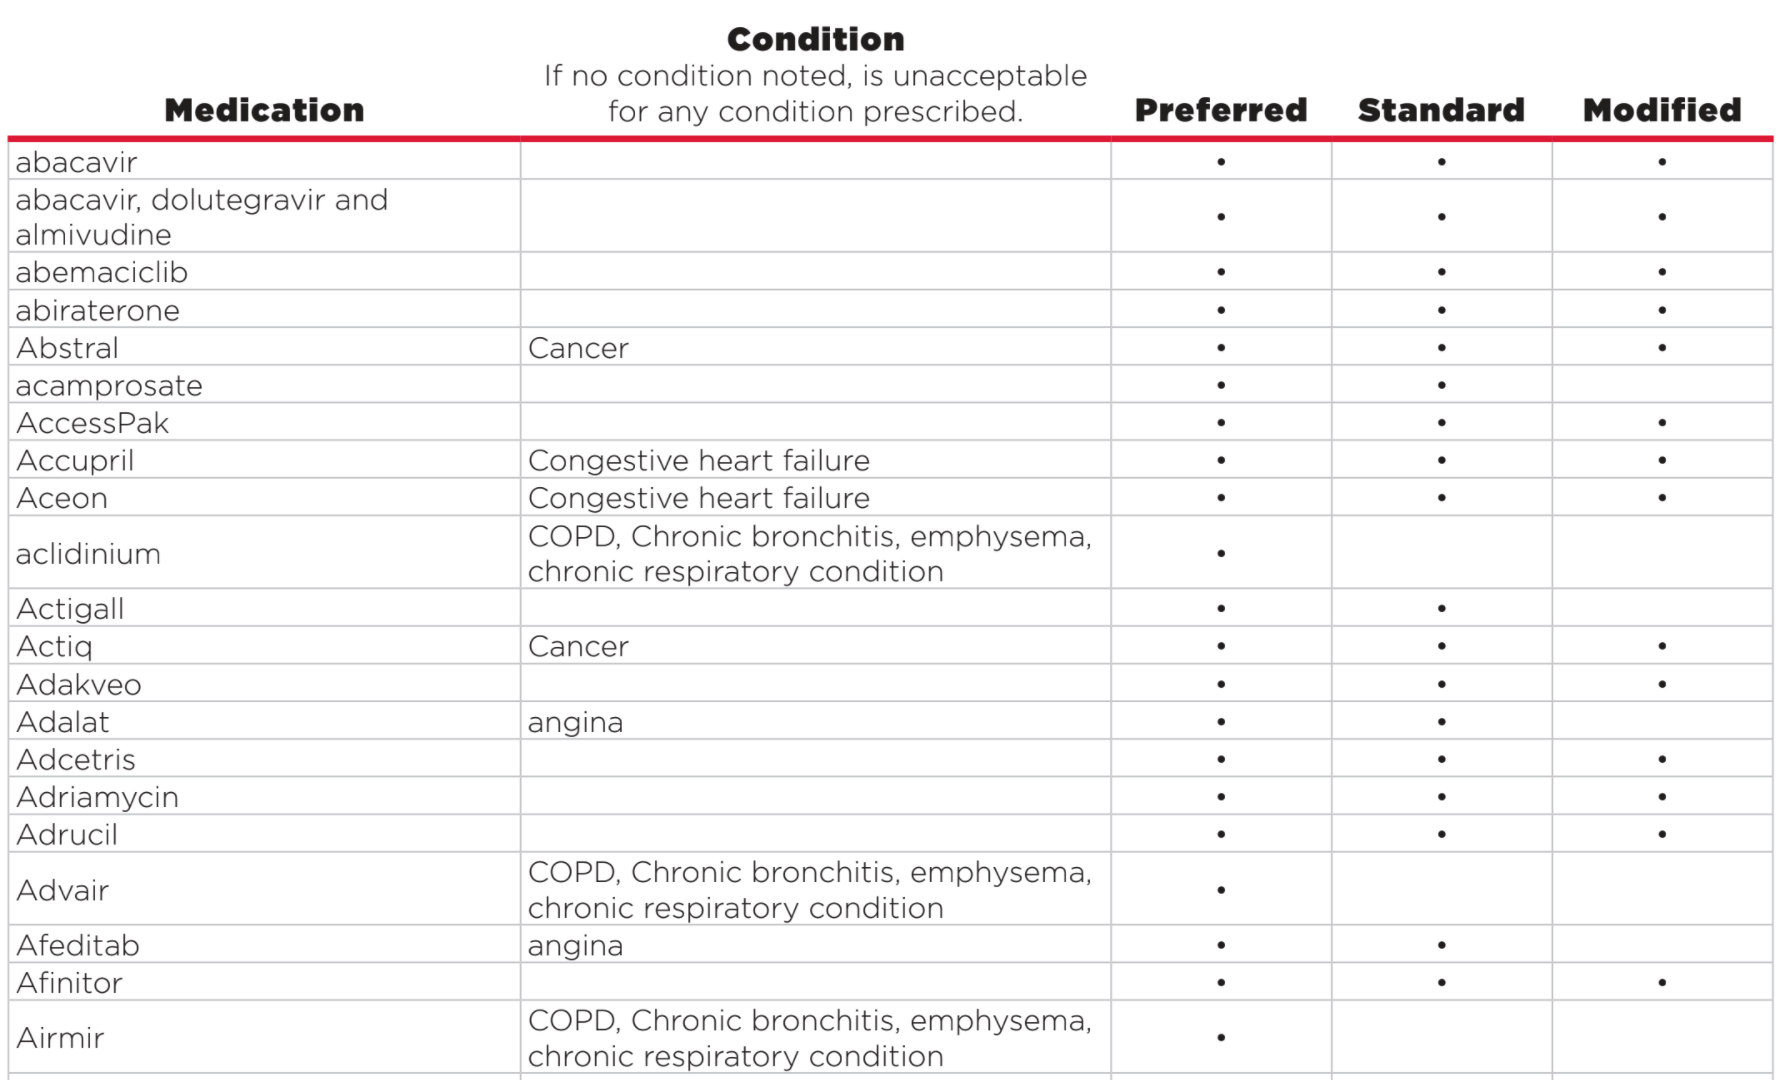 Accendo-CVS-Health-Drug-List-Final-Expense